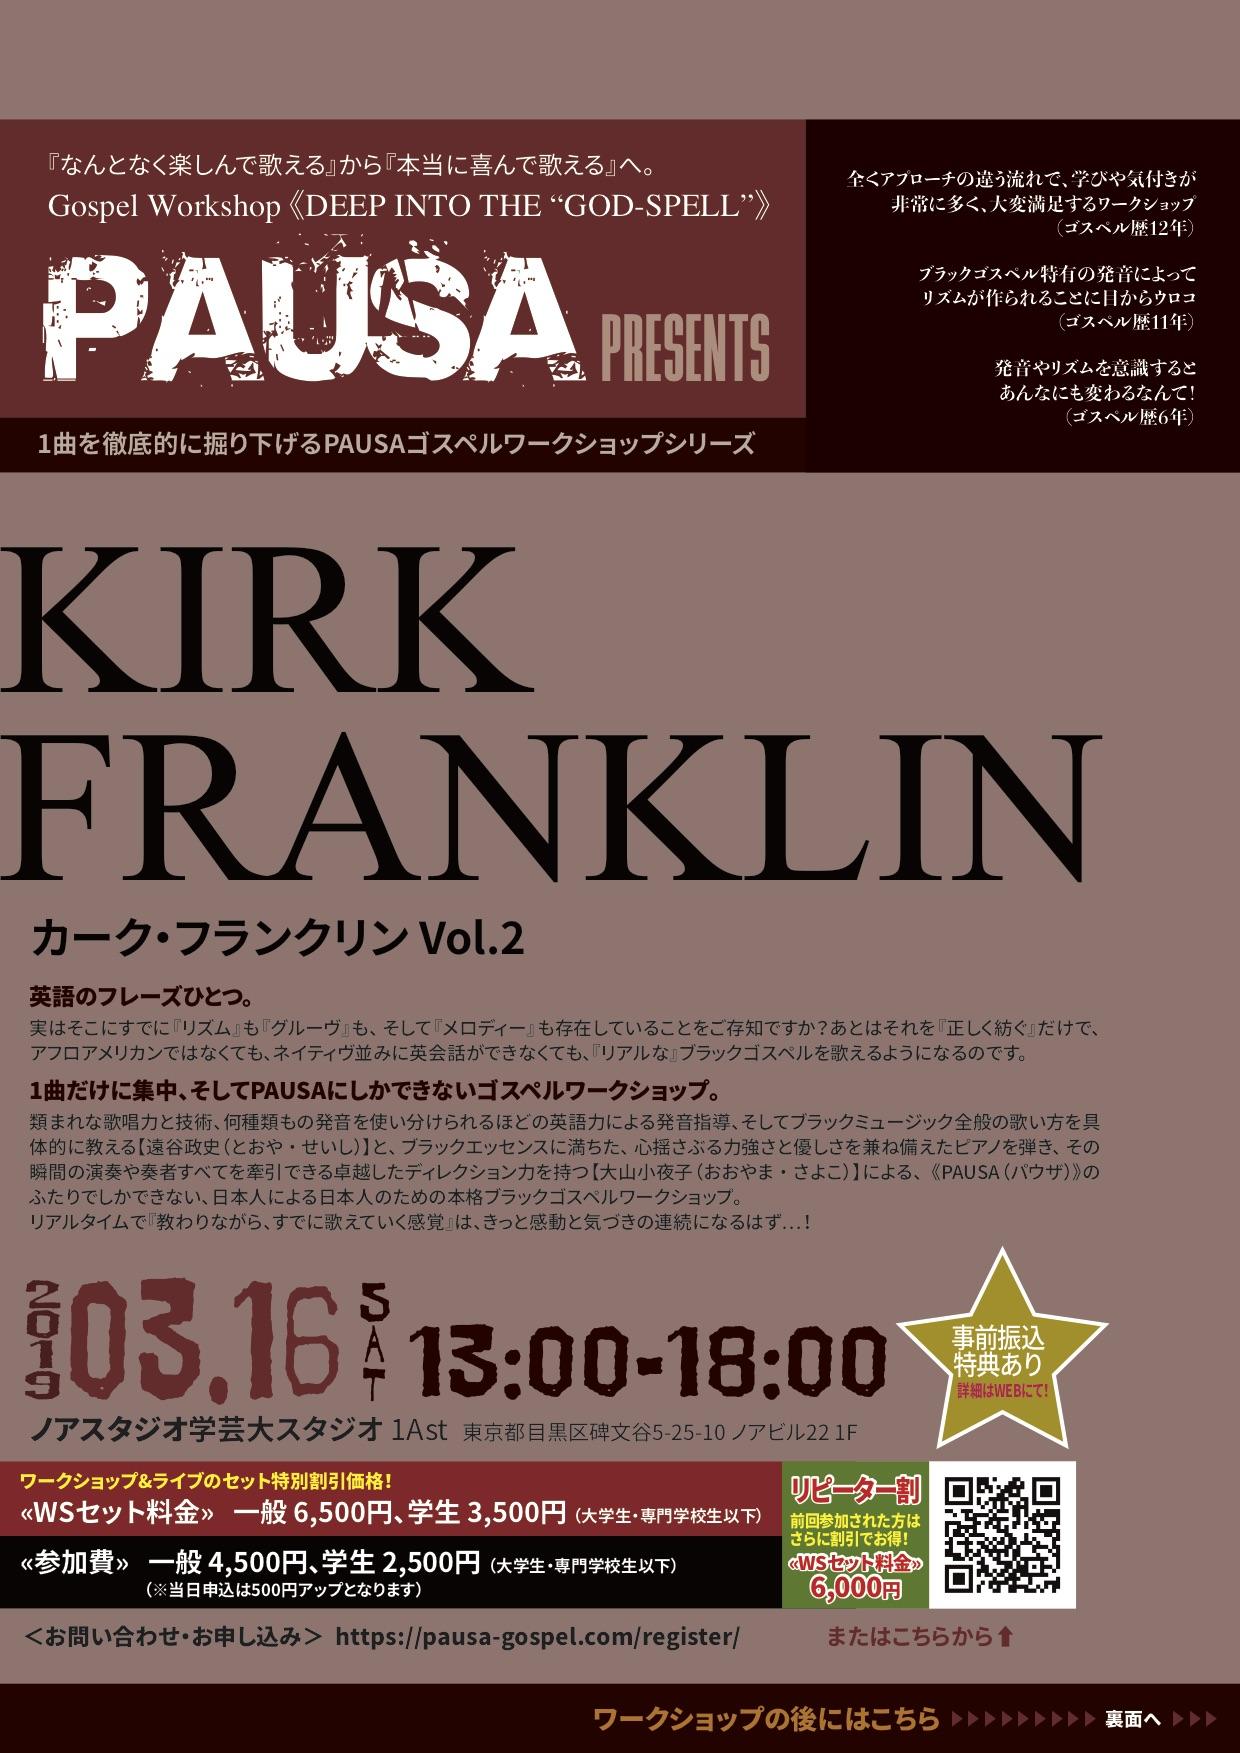 [2019.3.16 SAT] PAUSAゴスペルワークショップシリーズ「Kirk Franklin vol.2」in 東京